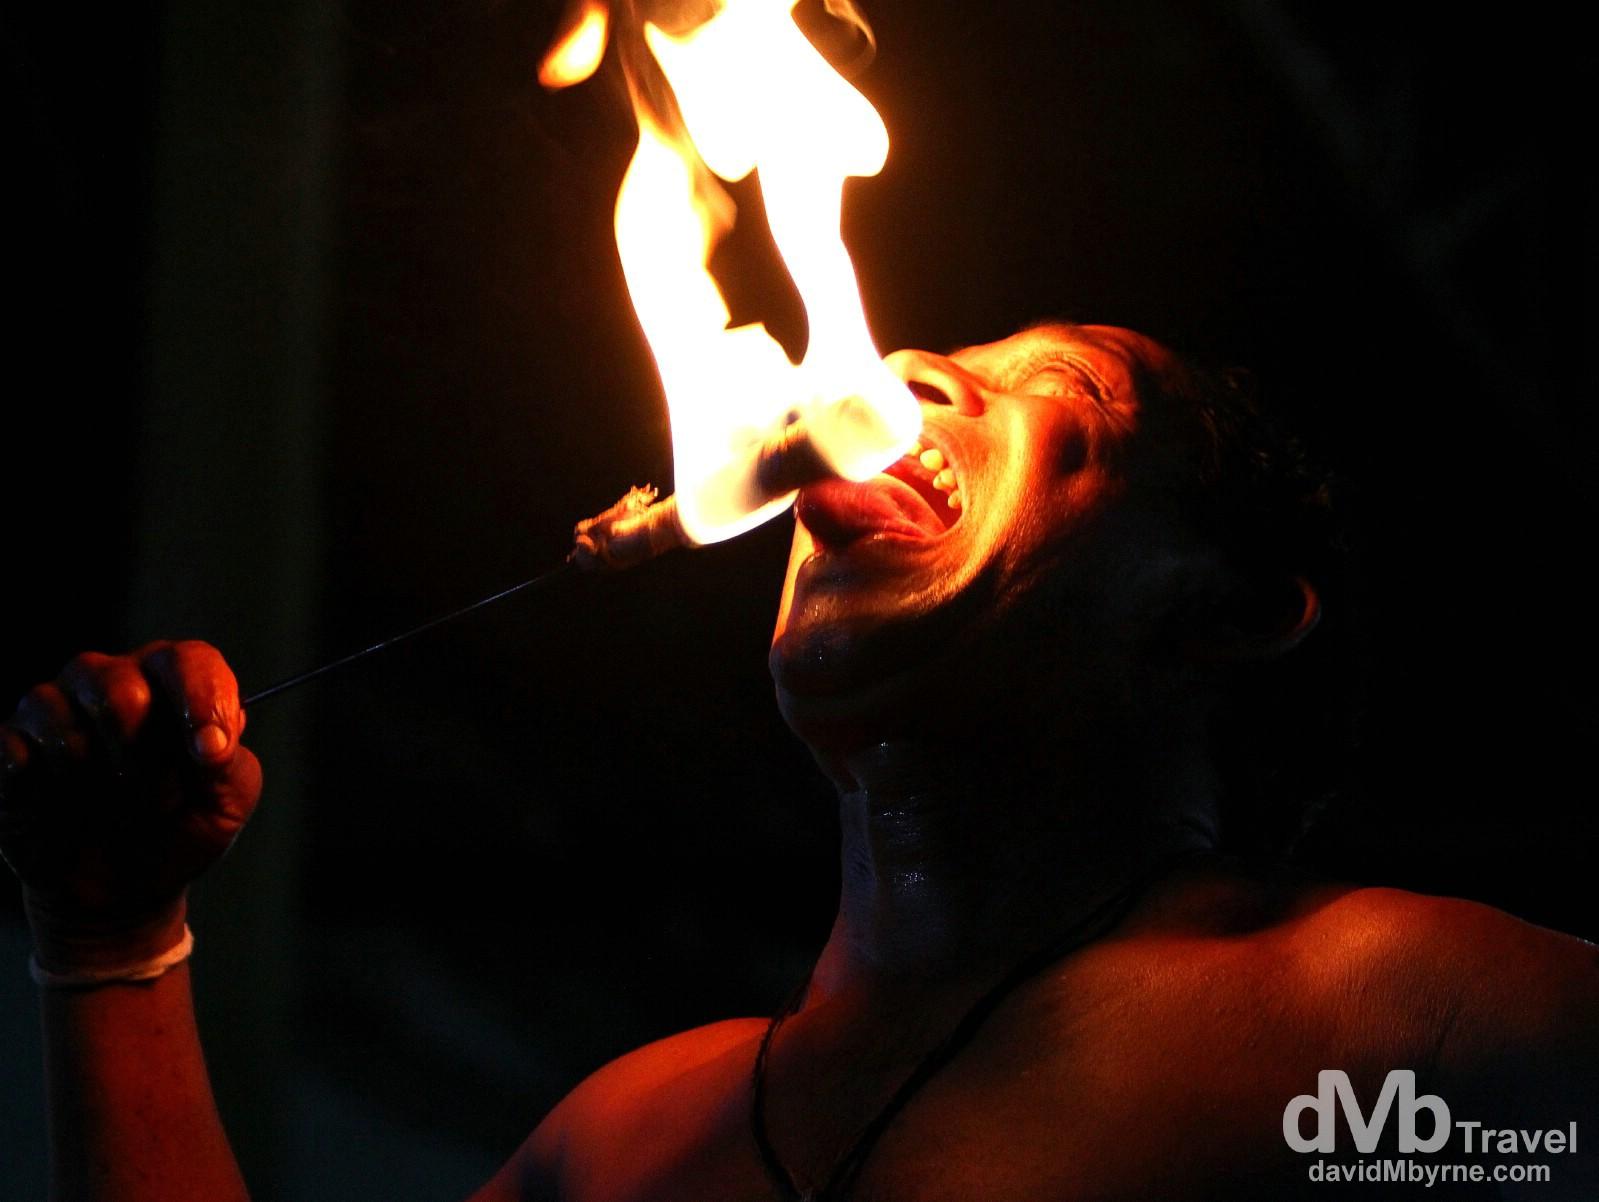 Eating fire as part of a Cultural Performance at the Kandyan Art Association & Cultural Centre, Kandy, Sri Lanka. September 9th 2012.